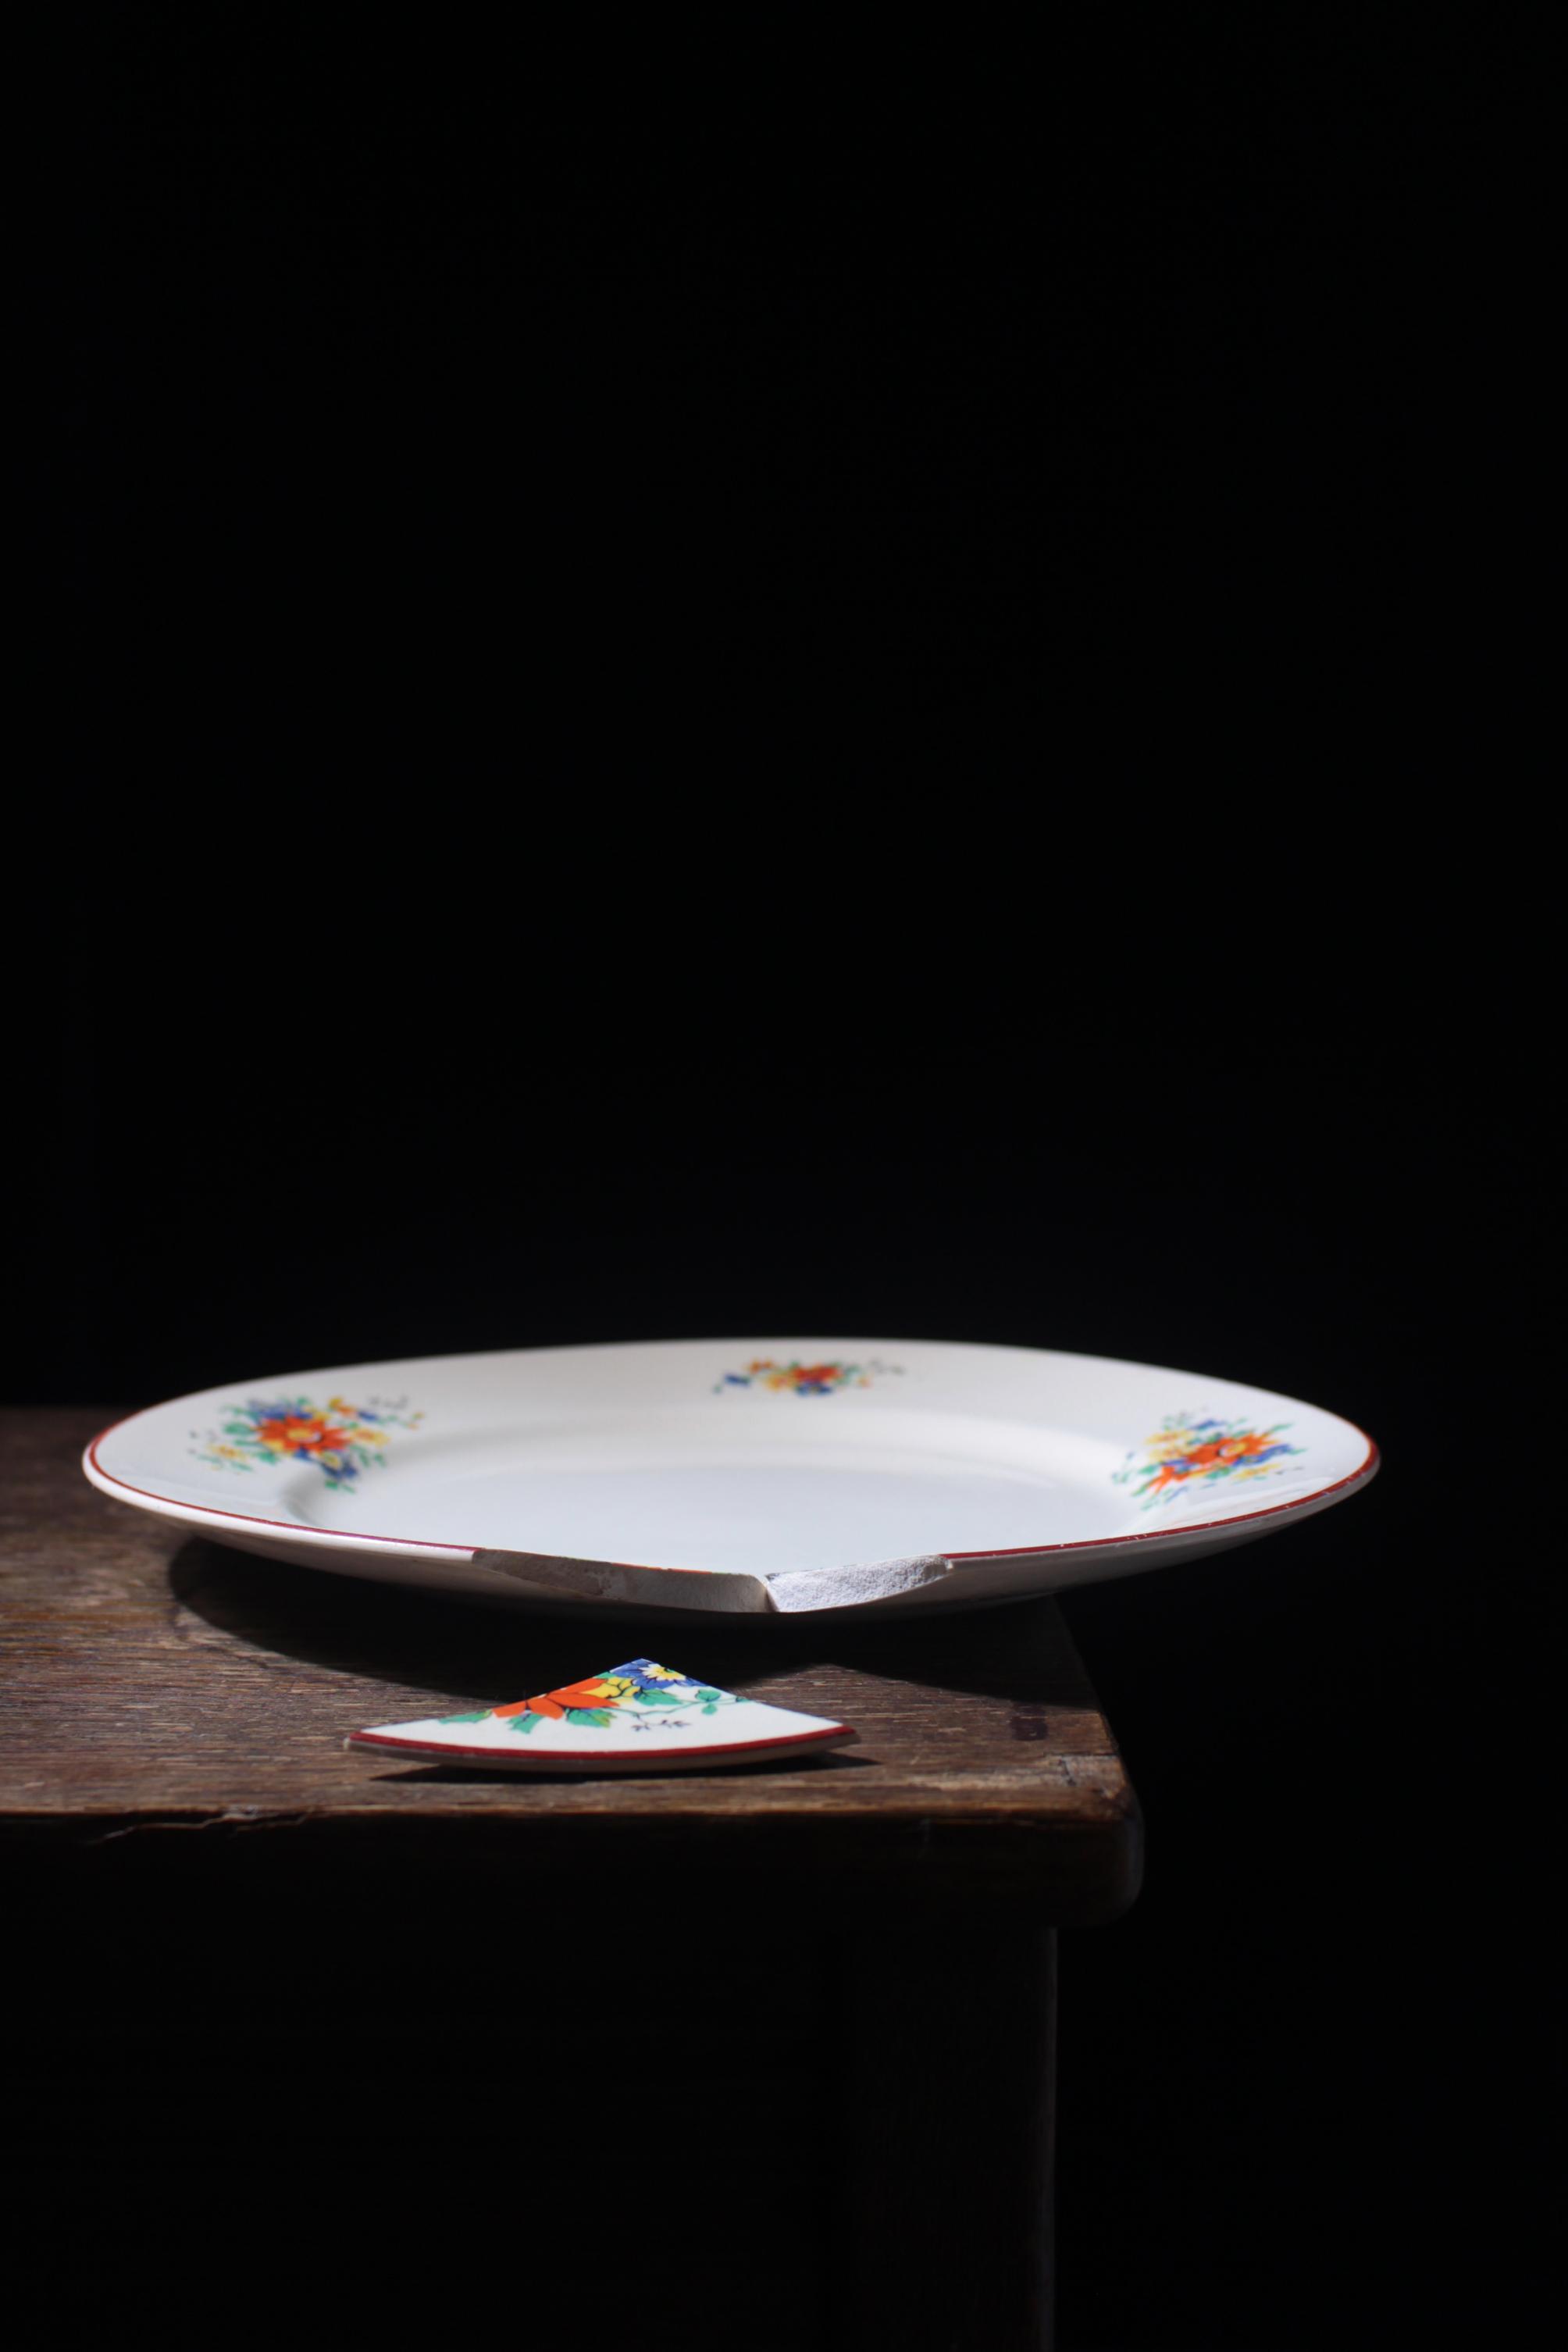 plate_new.jpg